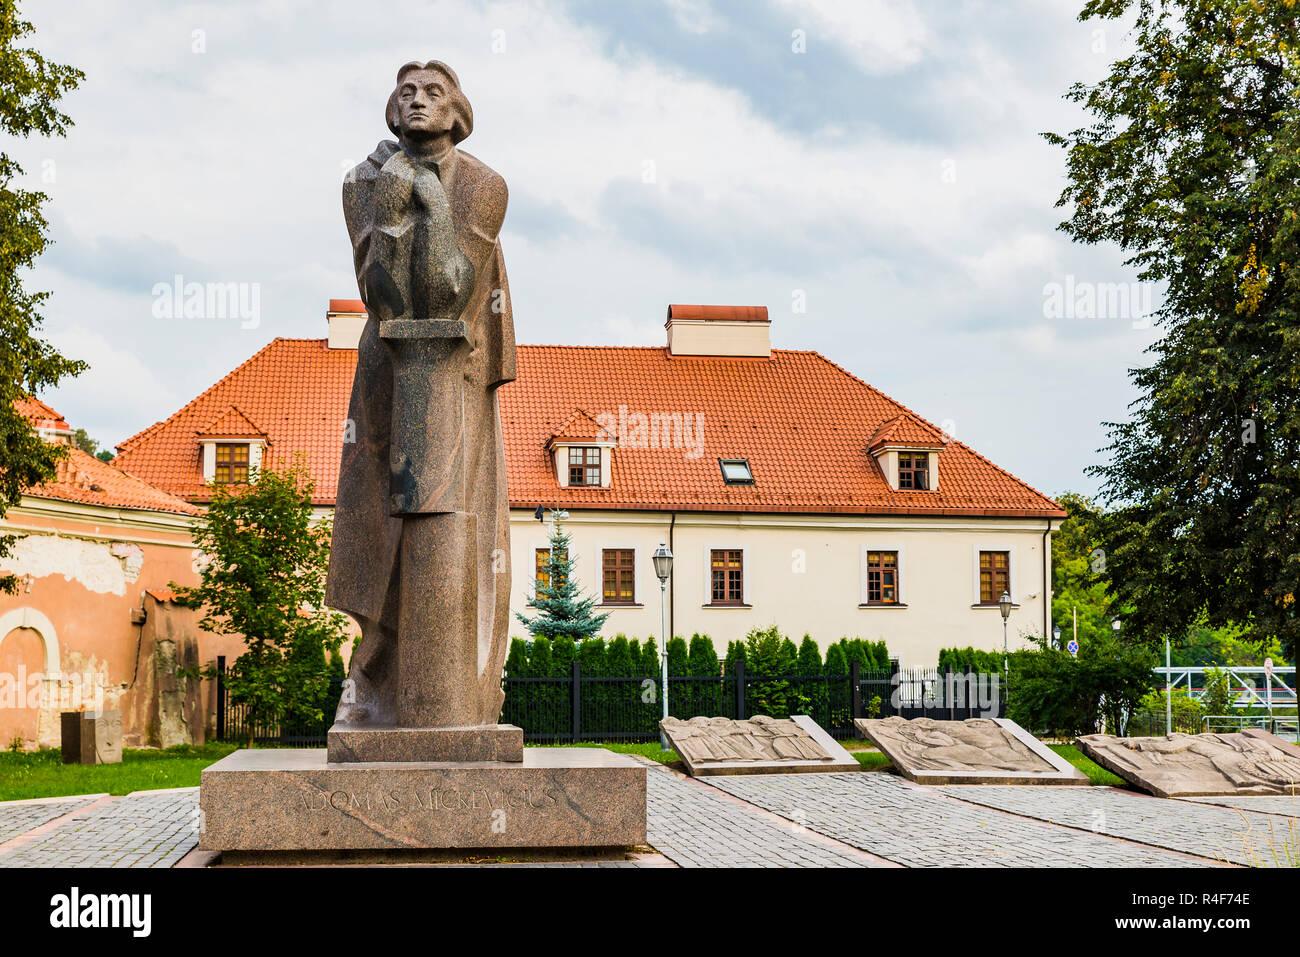 Adam Mickiewicz monument in Vilnius. Adam Bernard Mickiewicz was a Polish poet, dramatist, essayist, publicist, translator, professor of Slavic litera - Stock Image